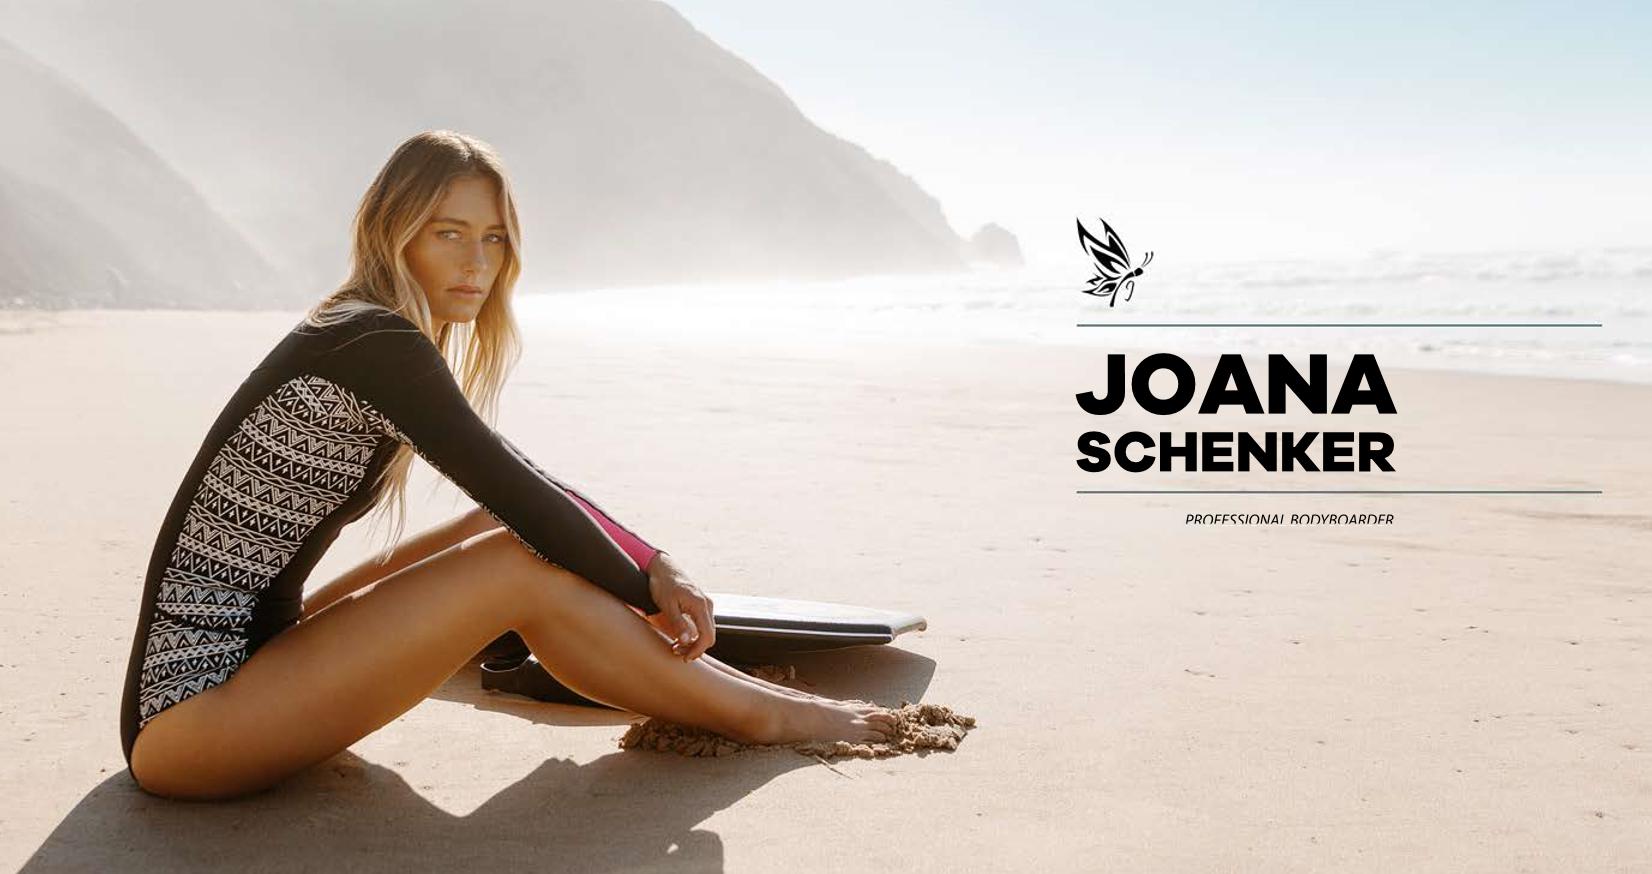 Joana Schenker: renovado o apoio à Campeã de Bodyboard